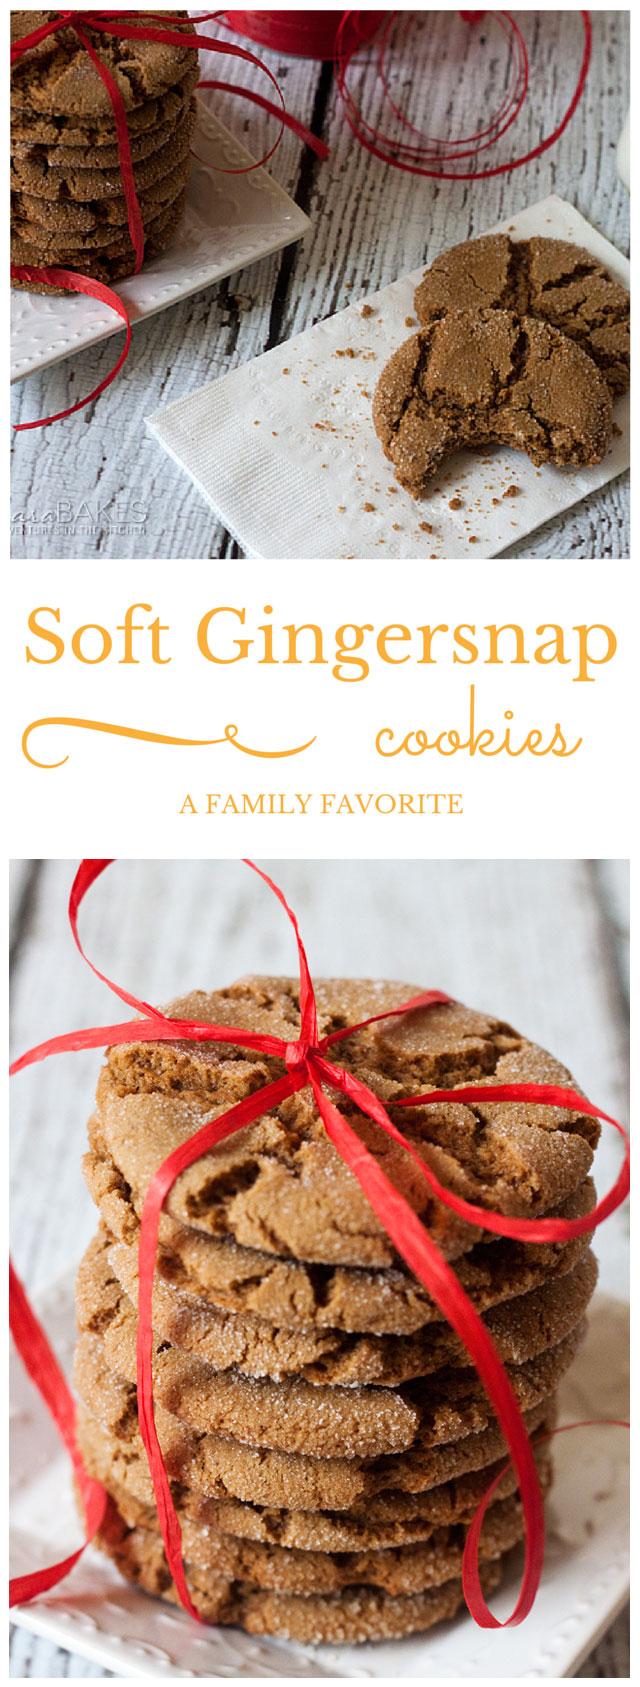 Gingersnap-Cookies-Collage-Barbara-Bakes